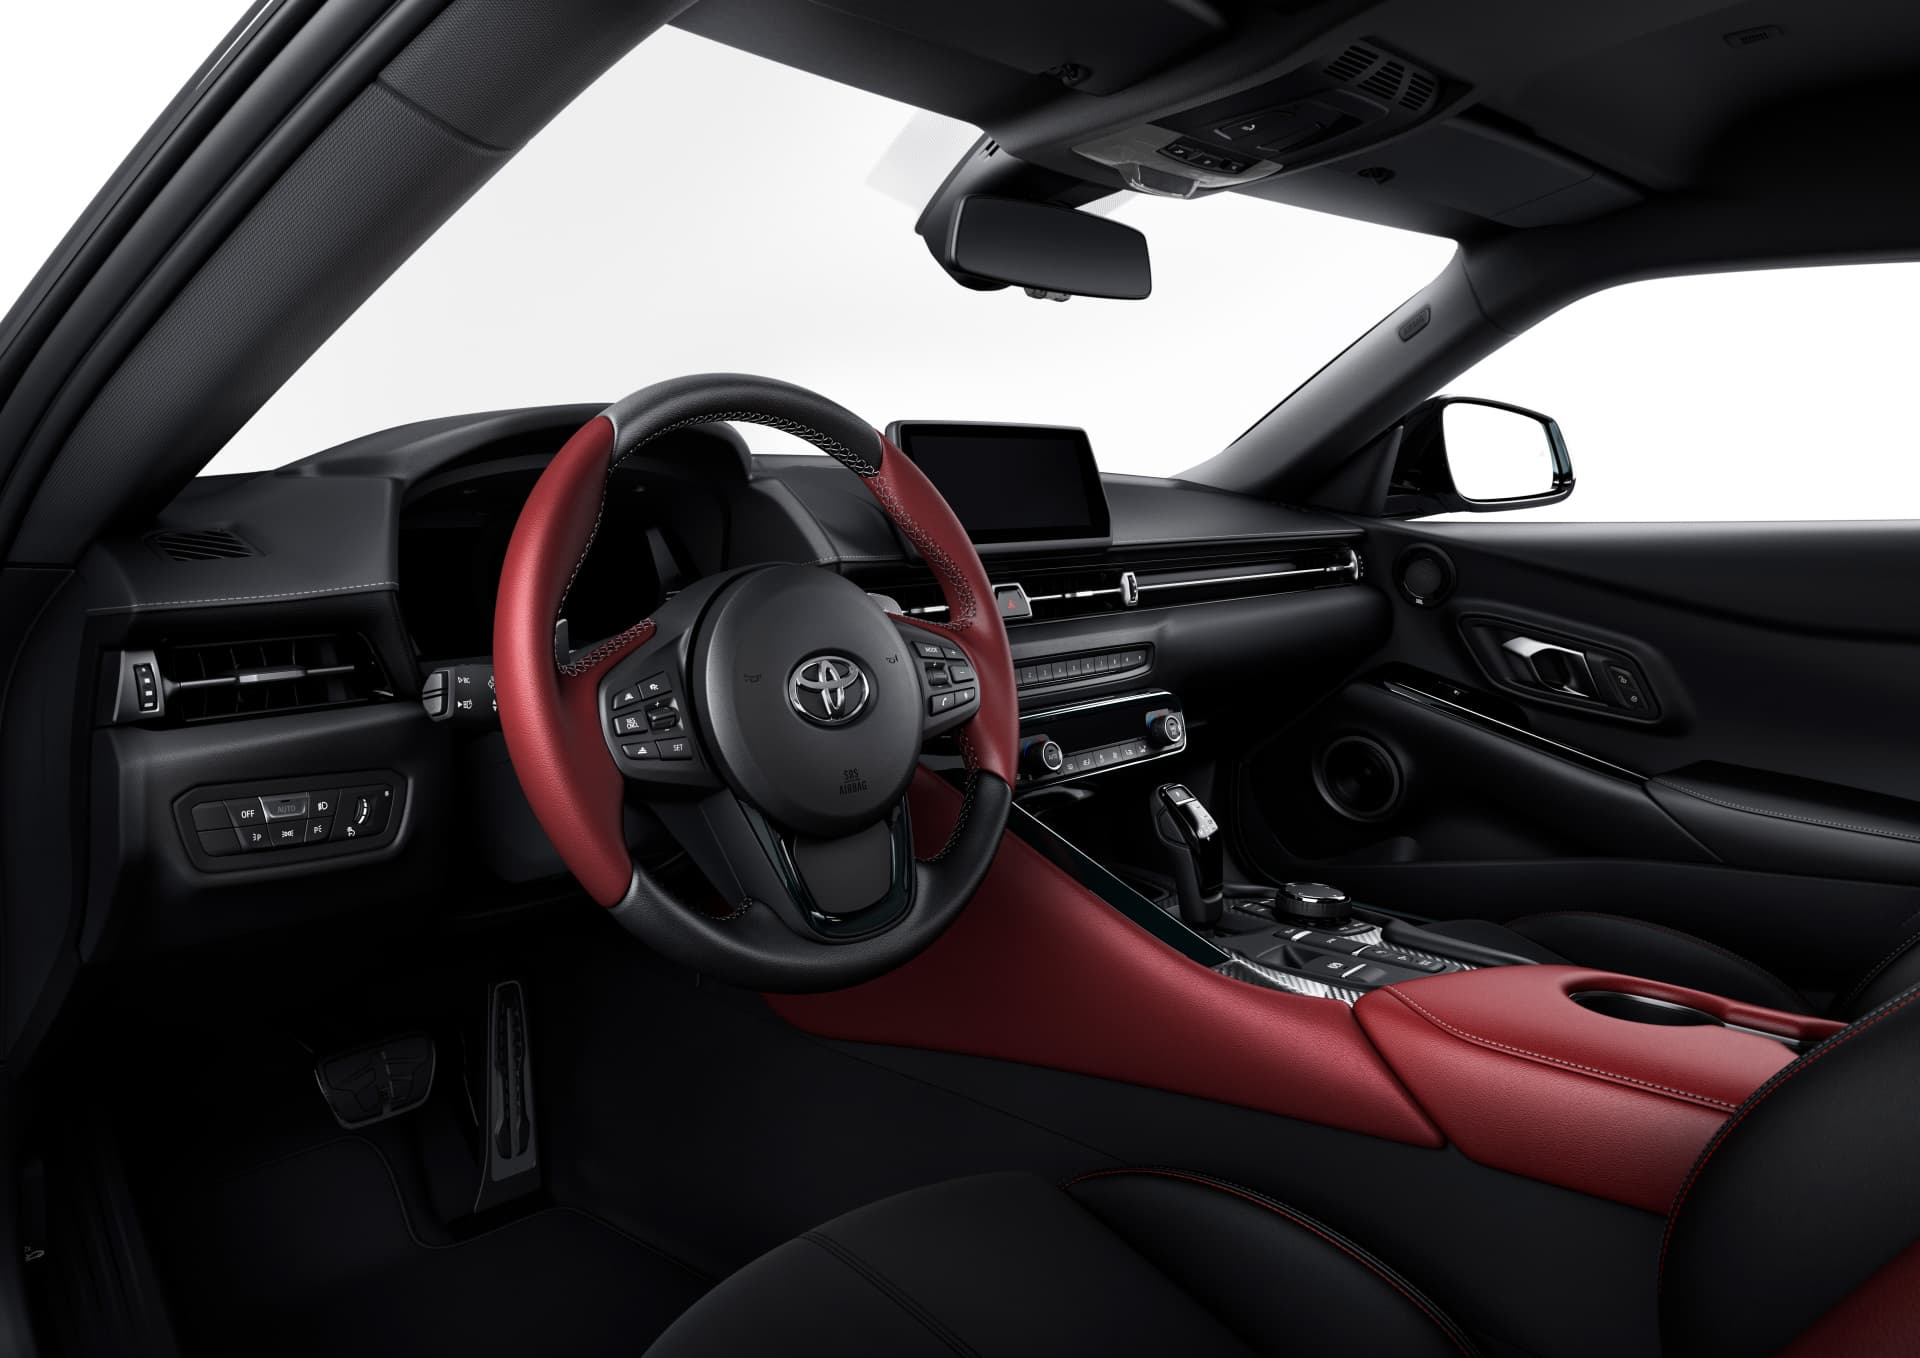 Interior Toyota Supra 20190114 02 05